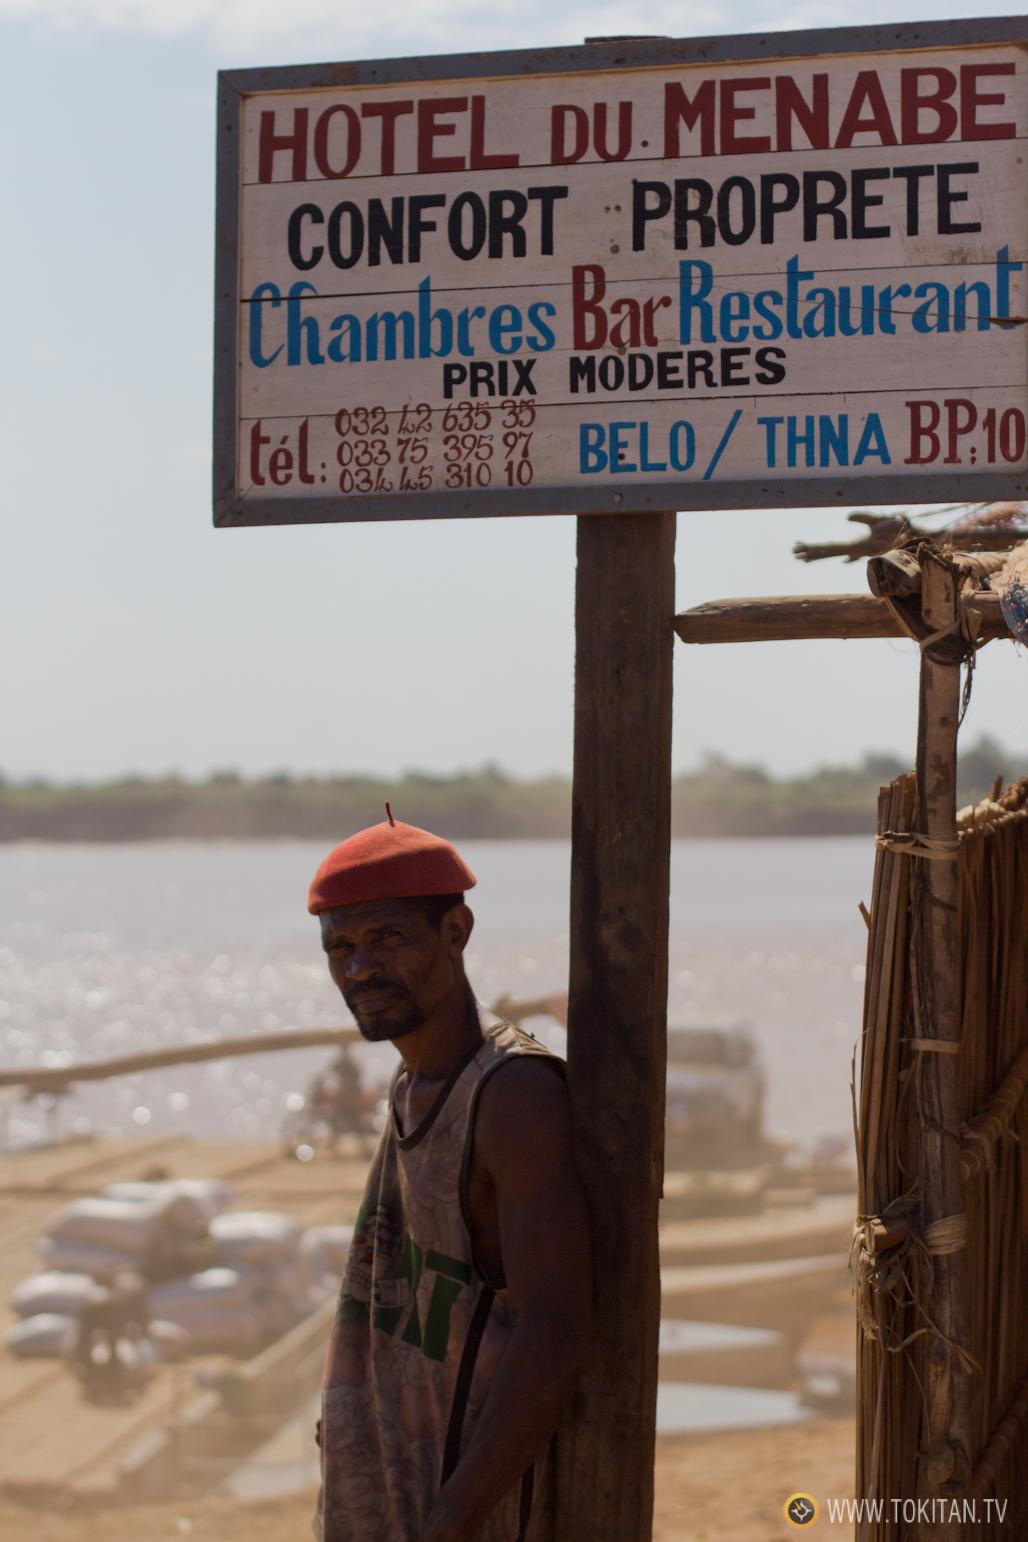 viajar_oeste_madagascar_transbordador_ rio_belo_sur_tsiribihina_menabe_pista_cartel_hotel_menabe